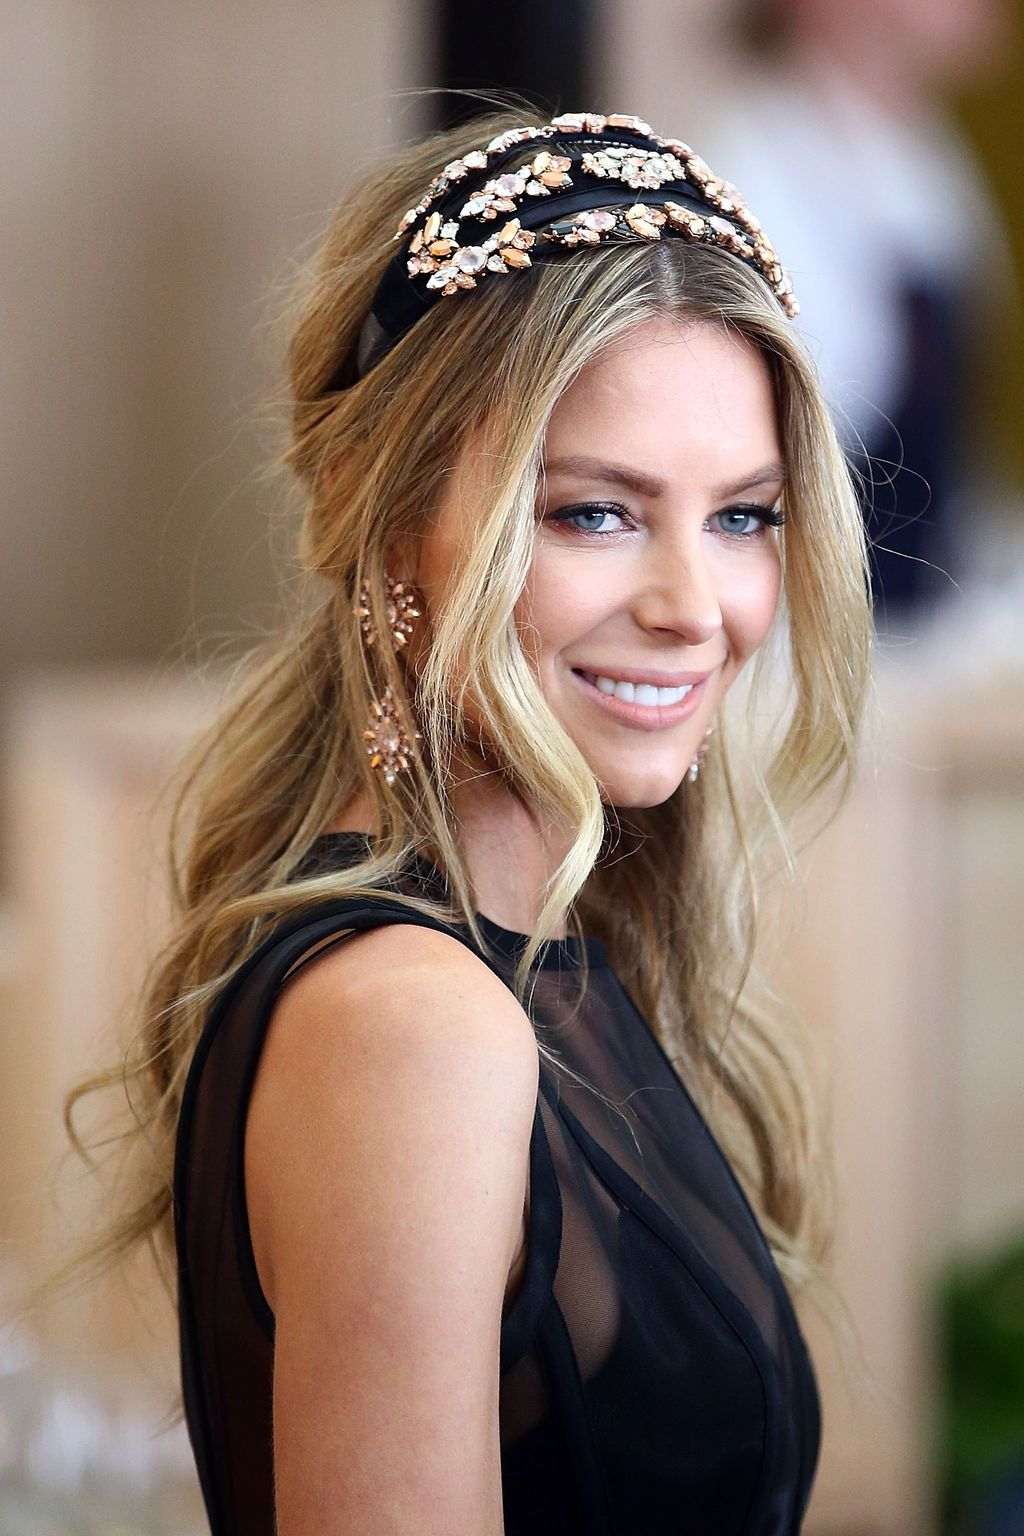 medium-how-to-style-hair-accessories-headbands-hairstyles-ways-to-wear-black-halfup-messy-ornate-dressy.jpg